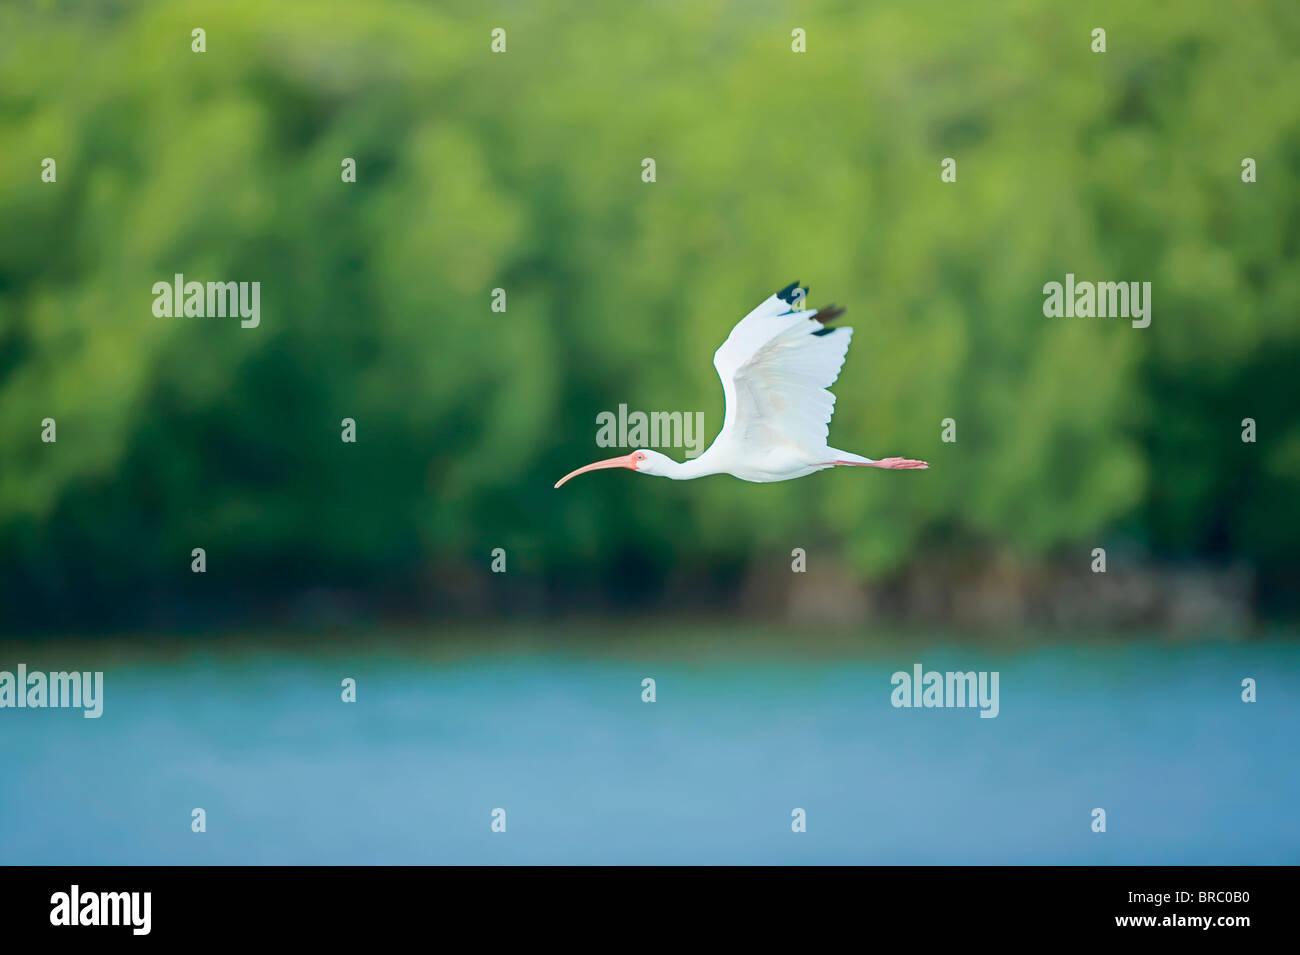 Roseate spoonbill (Ajaia ajaja) in flight, Sanibel Island, J. N. Ding Darling National Wildlife Refuge, Florida, - Stock Image